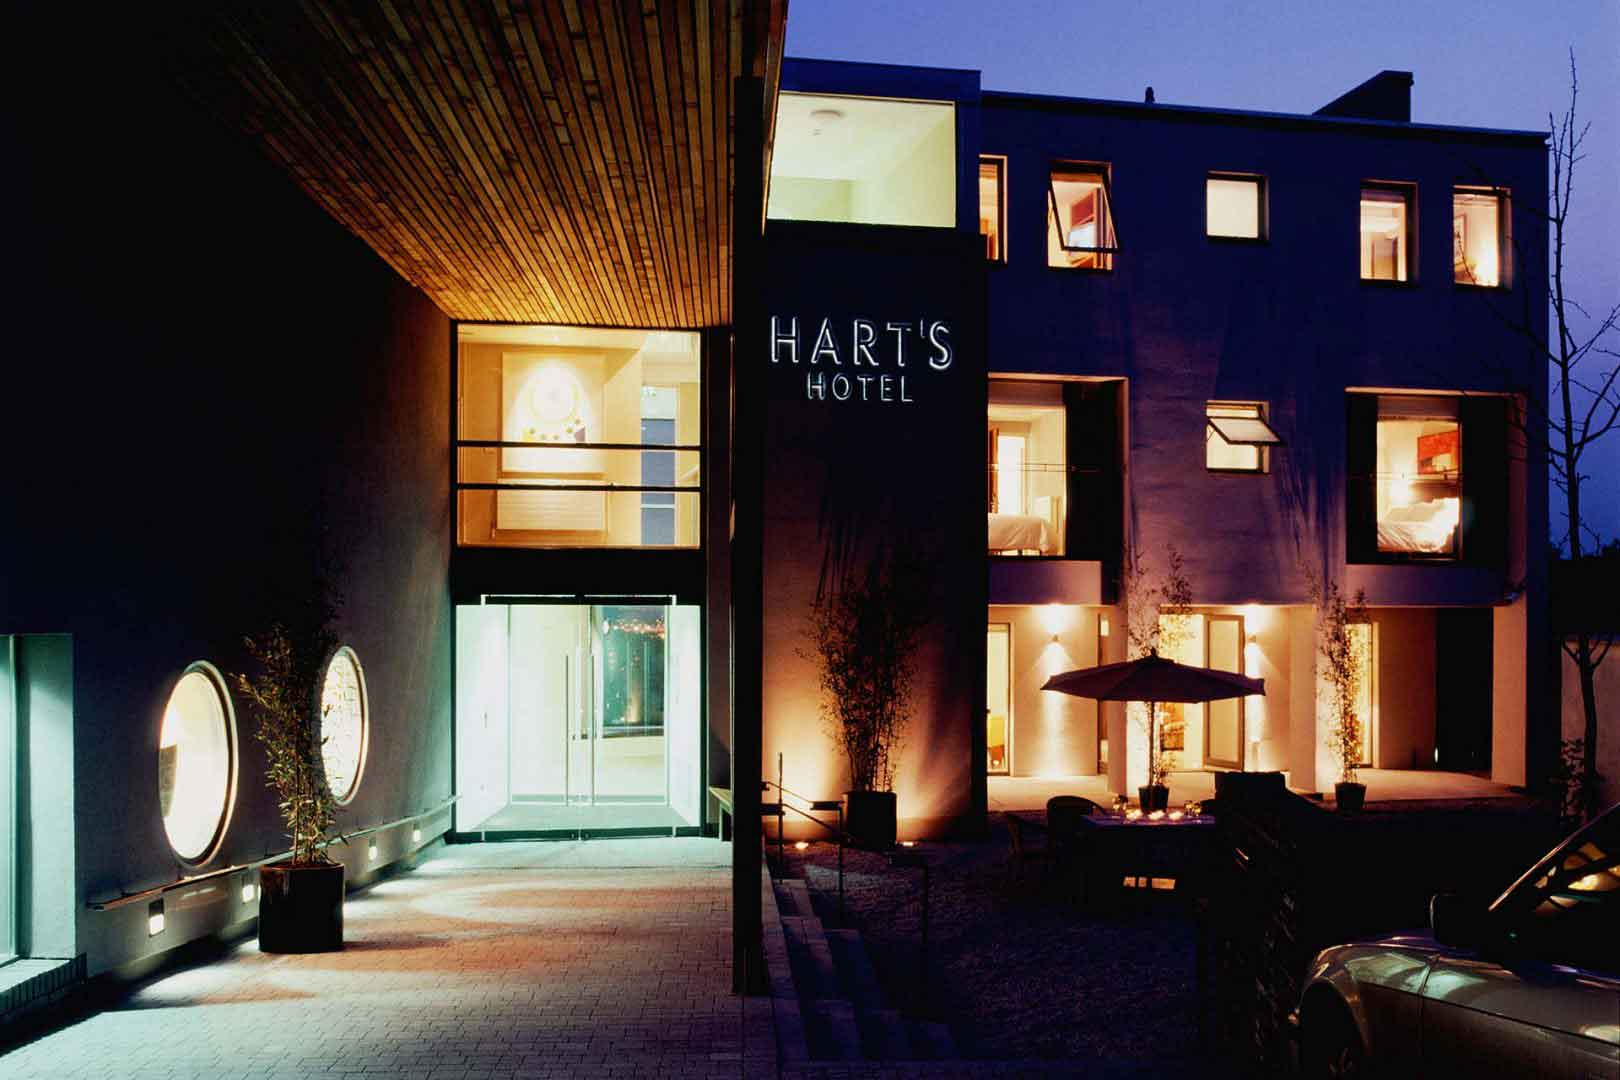 Hart's Hotel Night Stay